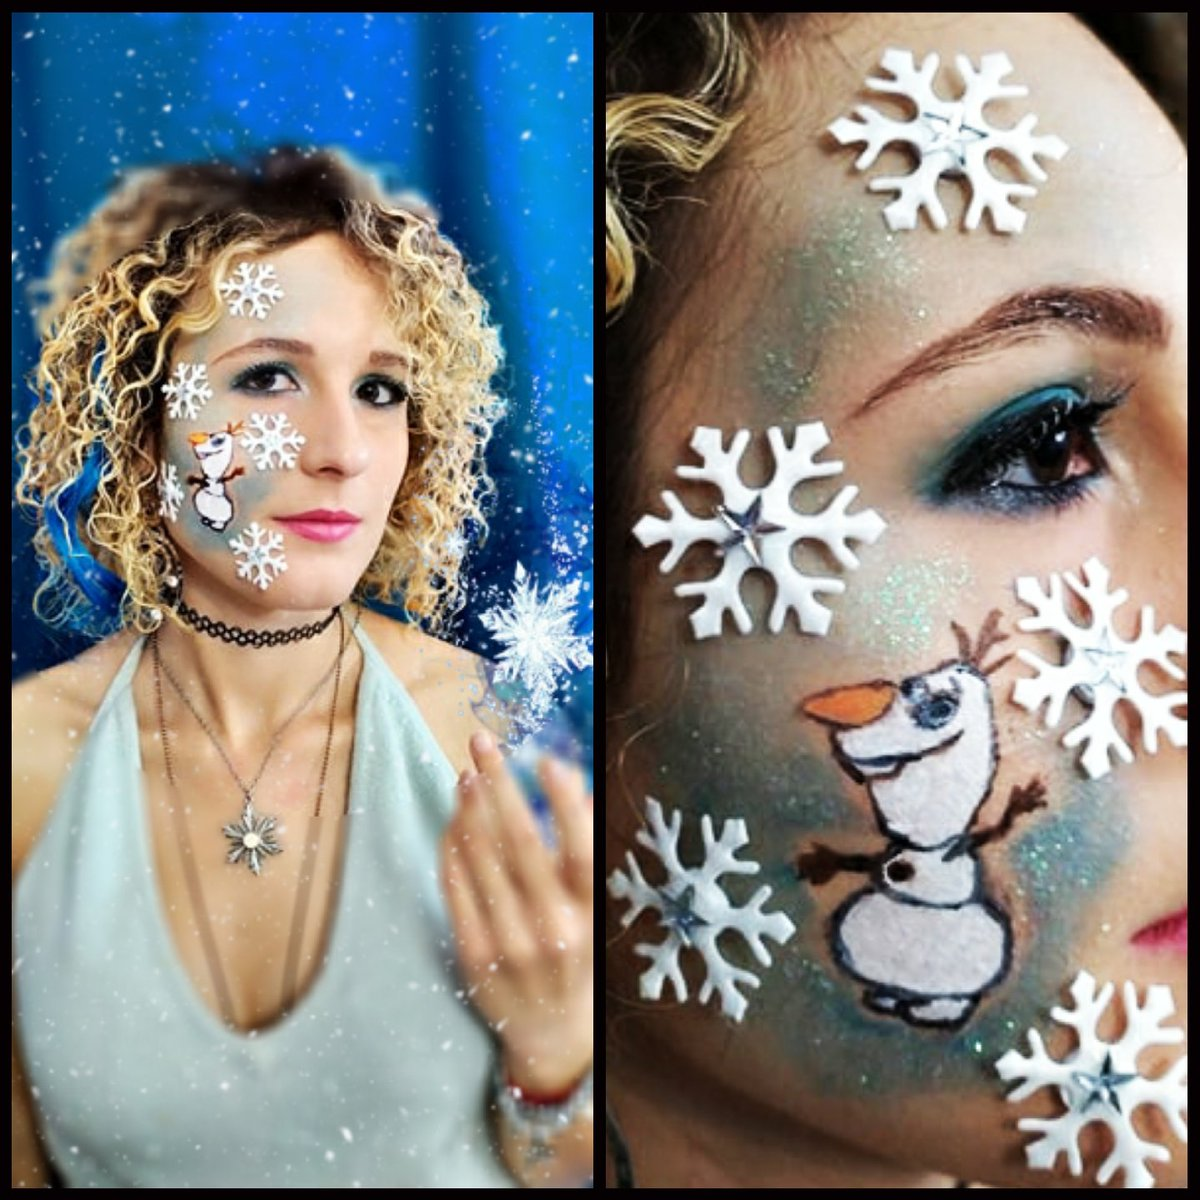 Some people are worth melting for #olaf #frozen #bodyart #bodypaint #bodypainting #facepaint #facepainting #photo #photography #muaideas #makeup #makeupartist #mua #FXmakeup #sfx #sfxmakeup #spfx #specialeffectsmakeup #specialeffects #crazymakeup #makeupworldwide #creativemakeuppic.twitter.com/M1Q67eYyCU